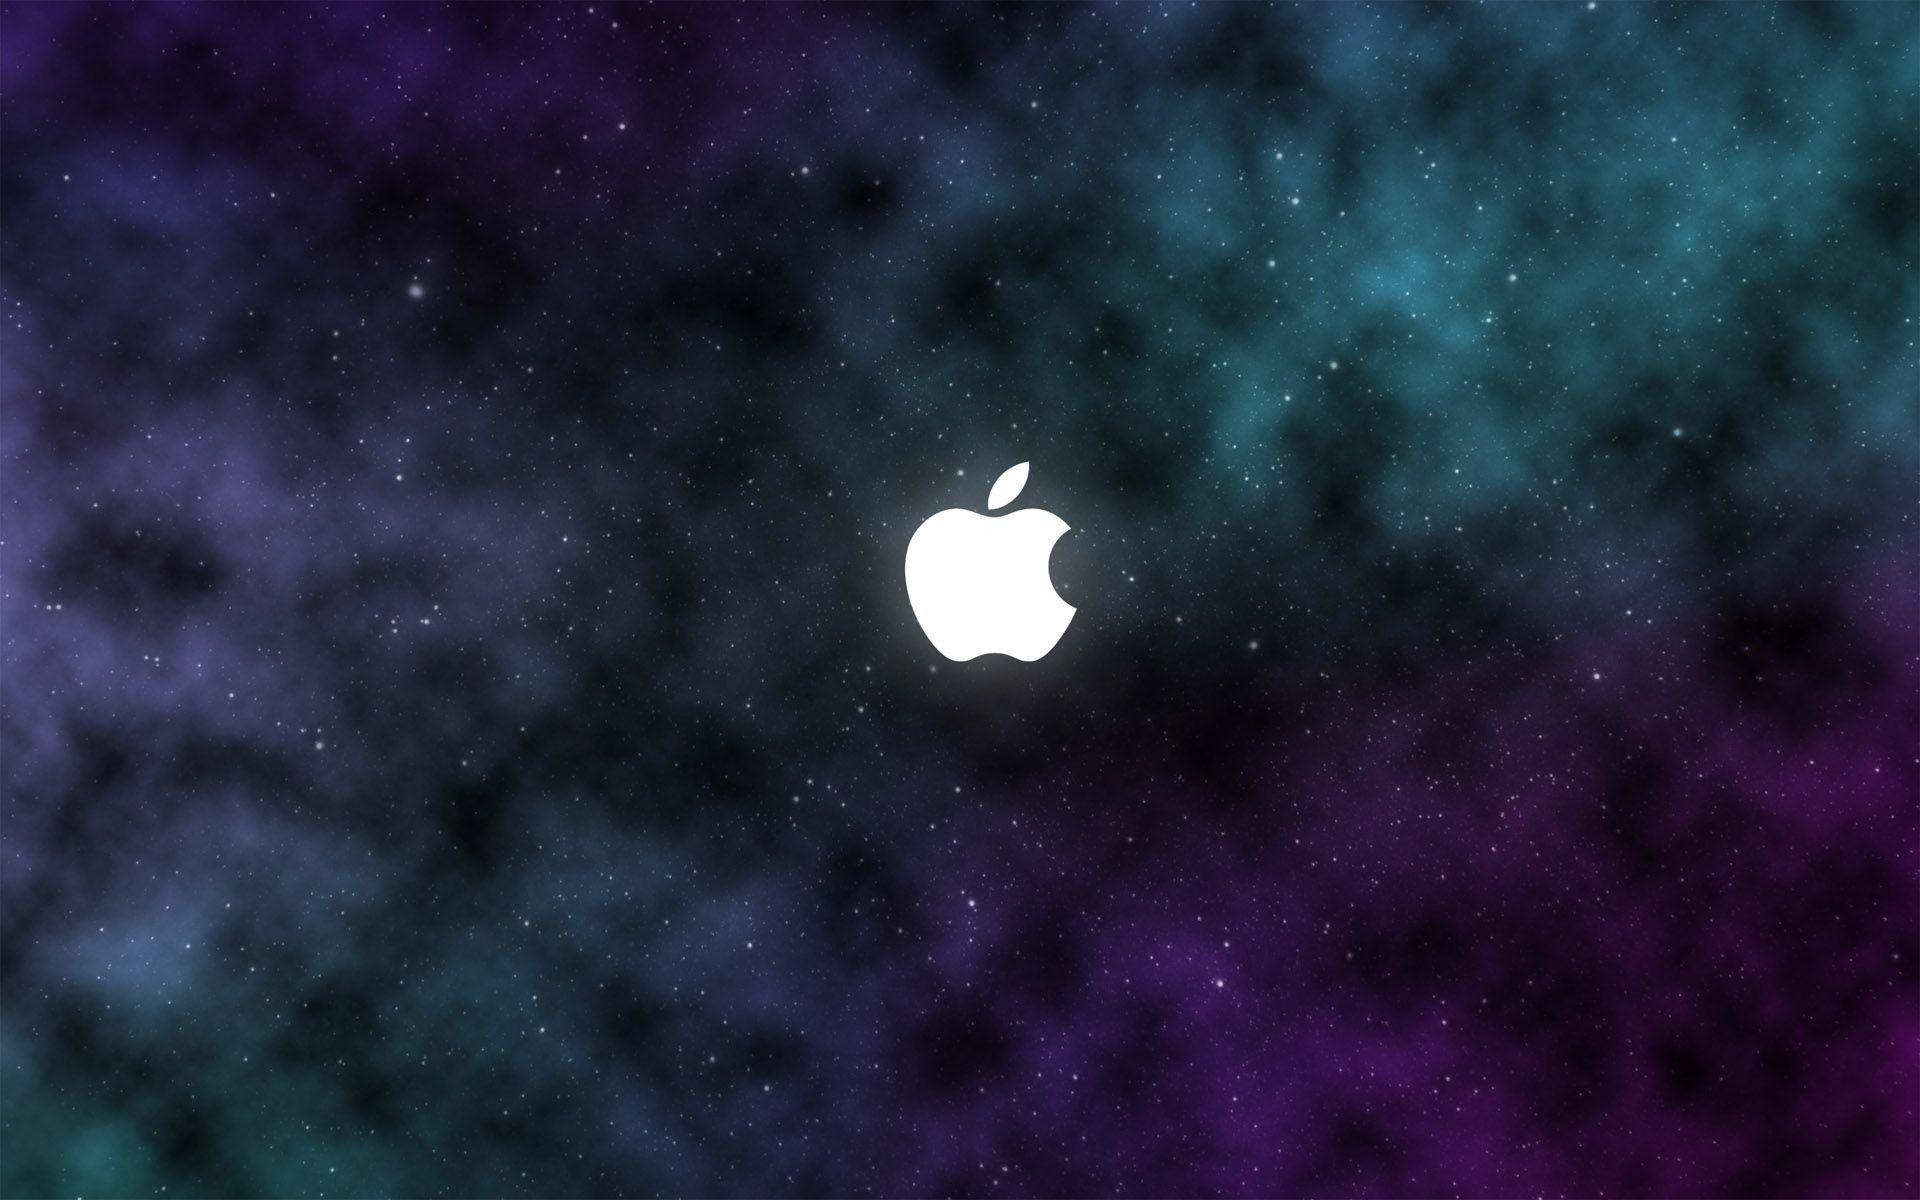 Apple Desktop Wallpapers HD - Wallpaper Cave  Apple Desktop W...